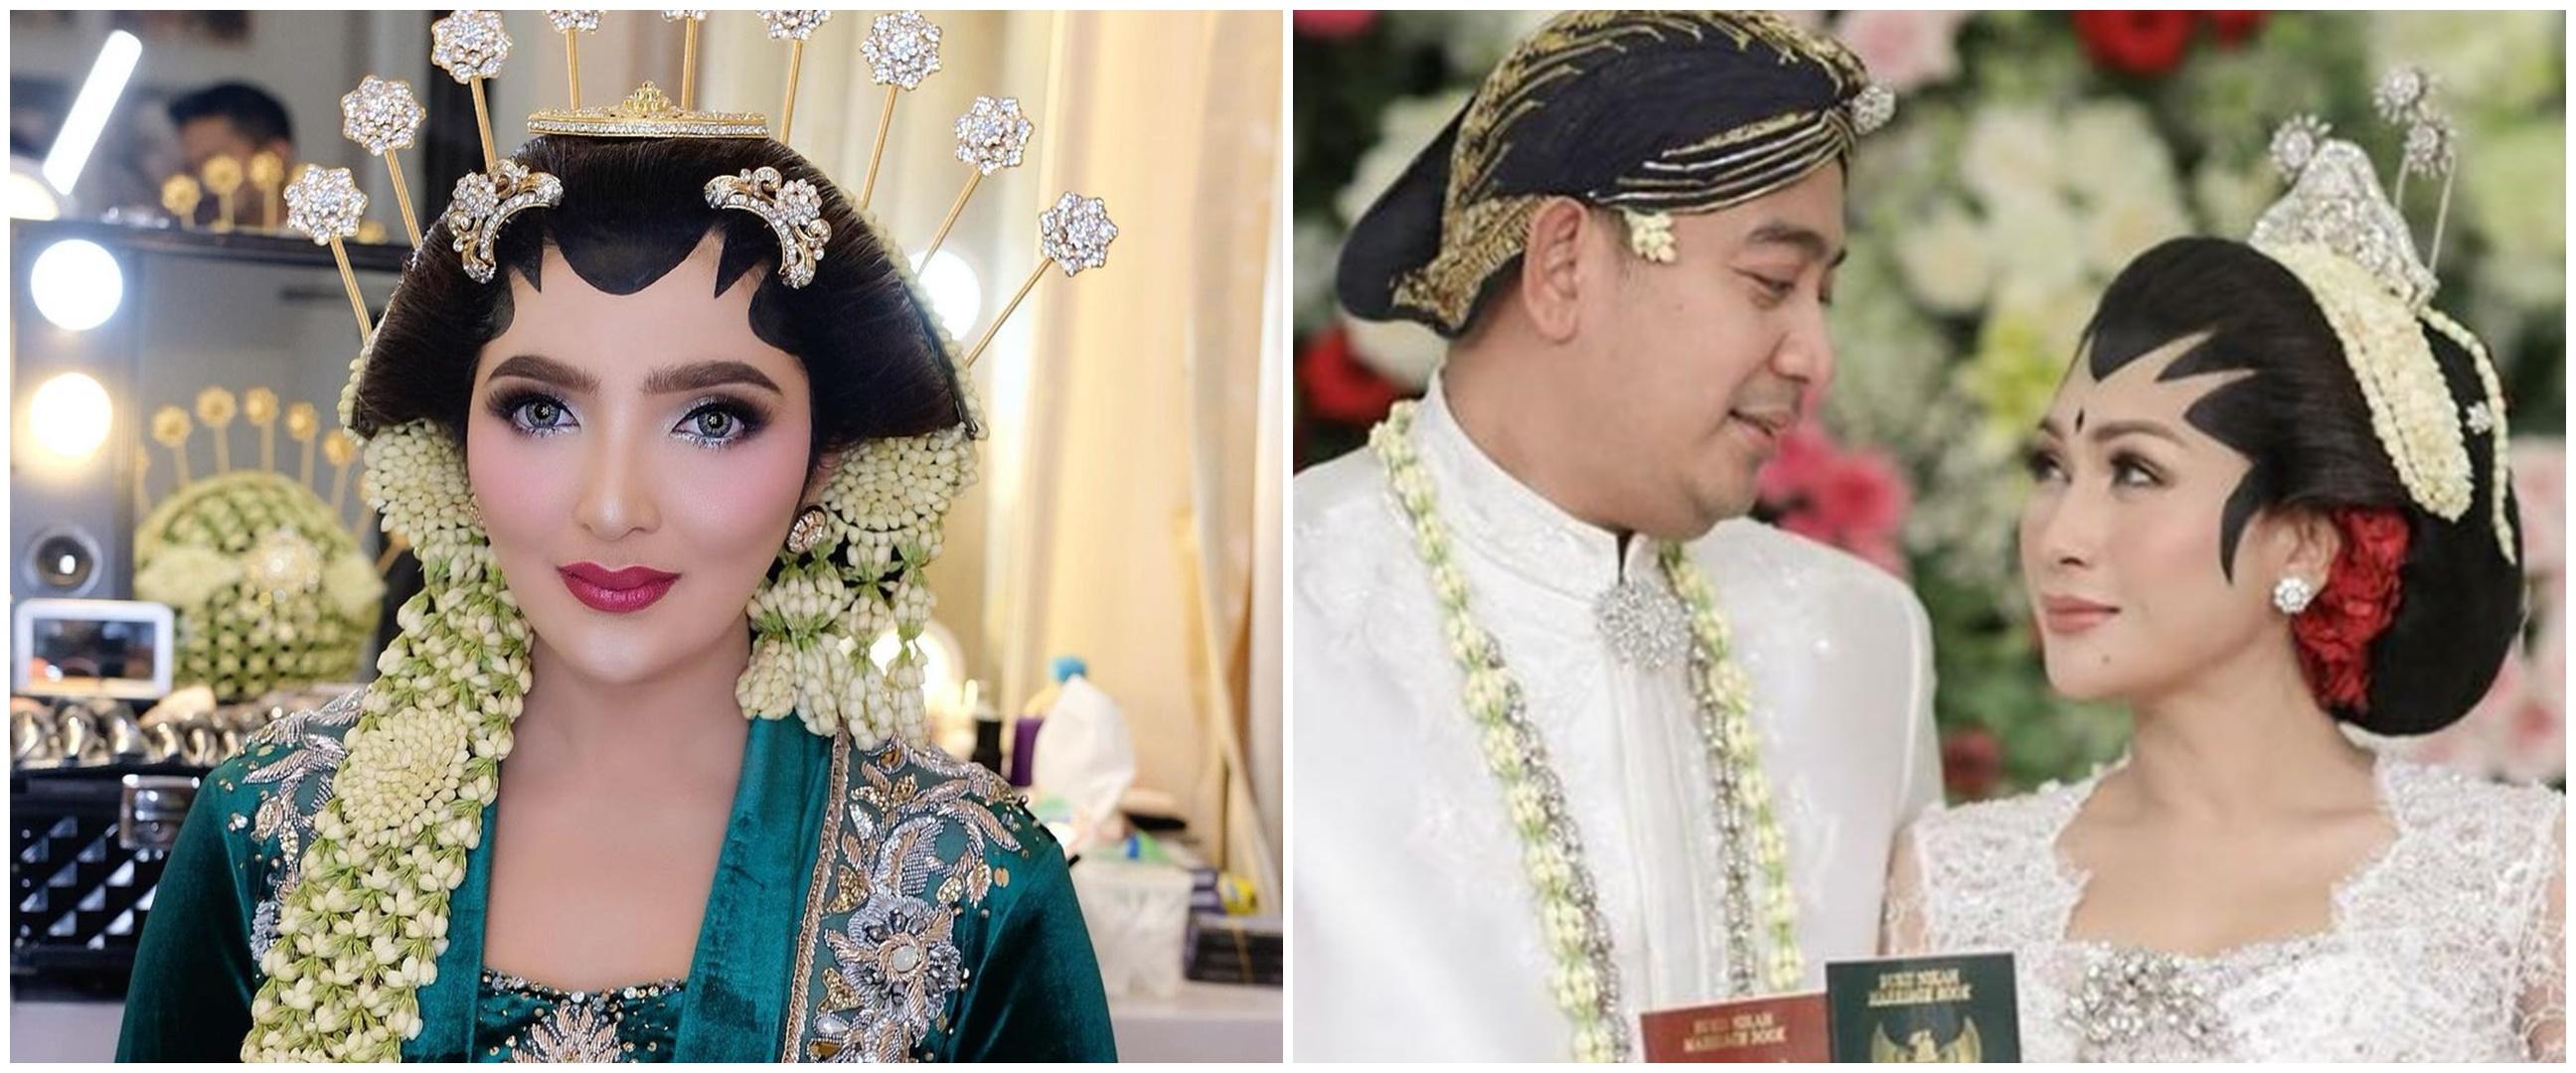 Pesona 7 penyanyi cantik saat pakai baju pengantin Jawa, memesona